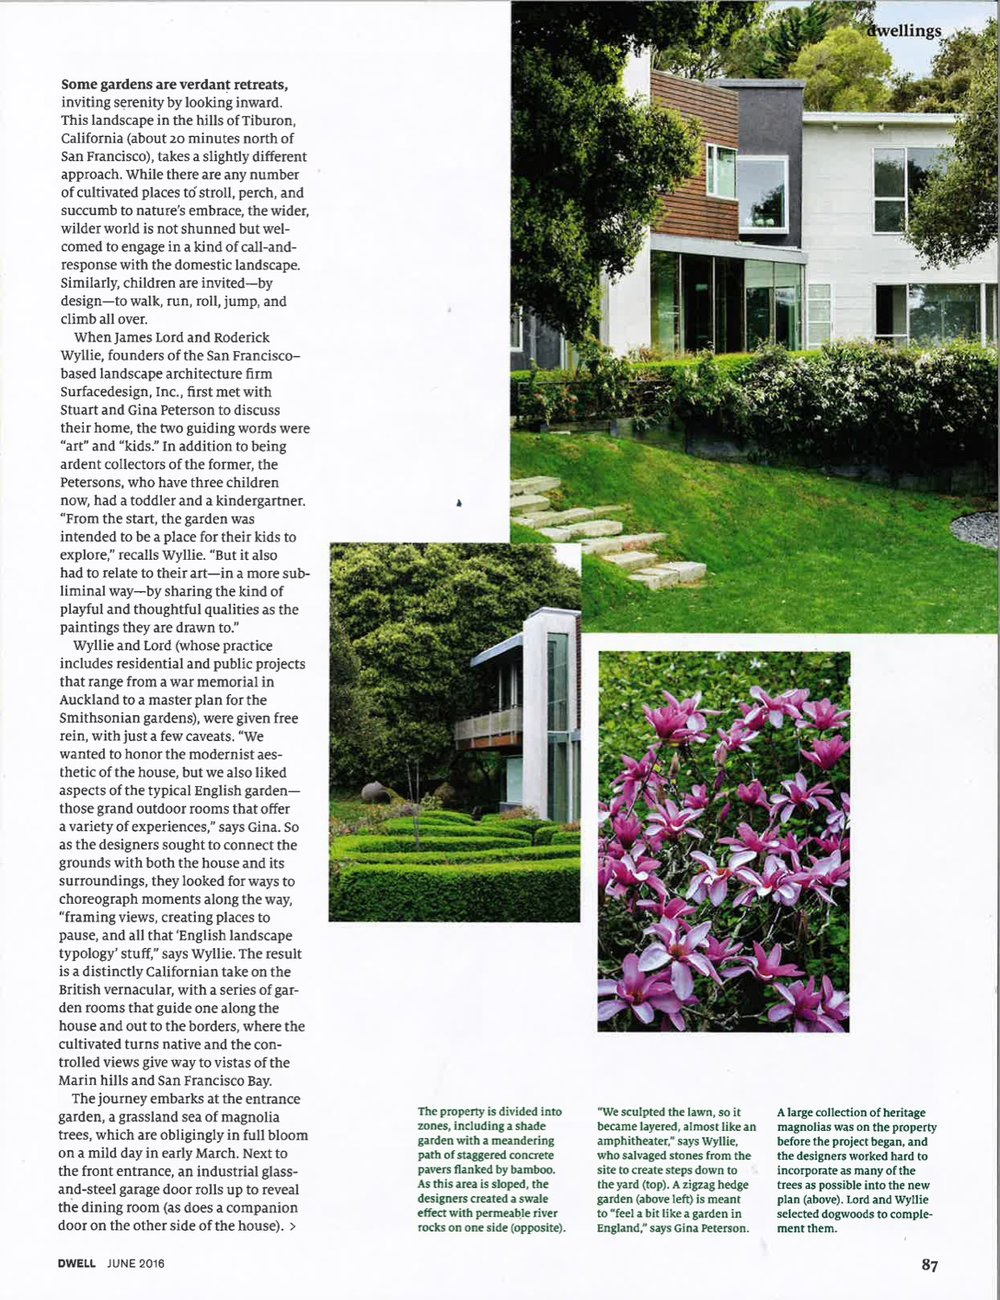 dwell magazine landscaping-06.jpg